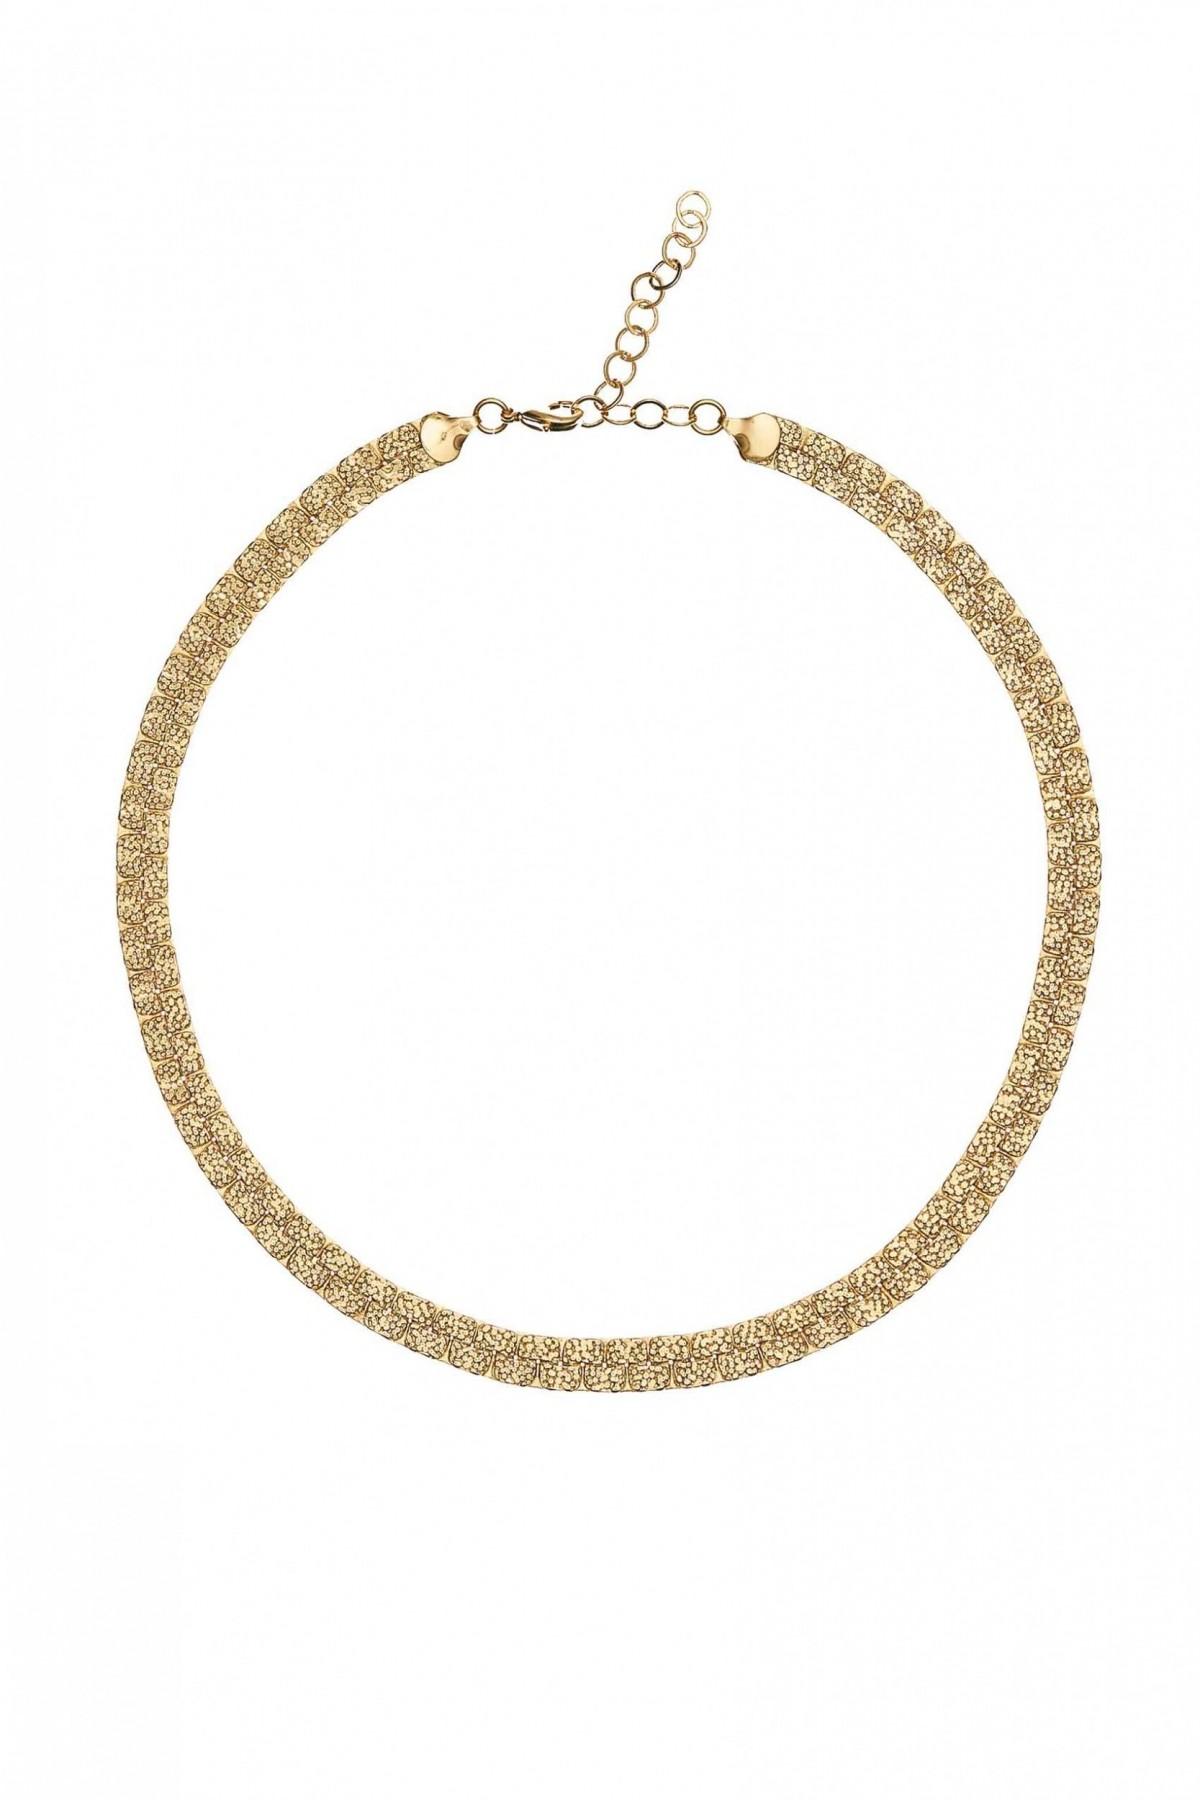 Fifth Avenue Necklace